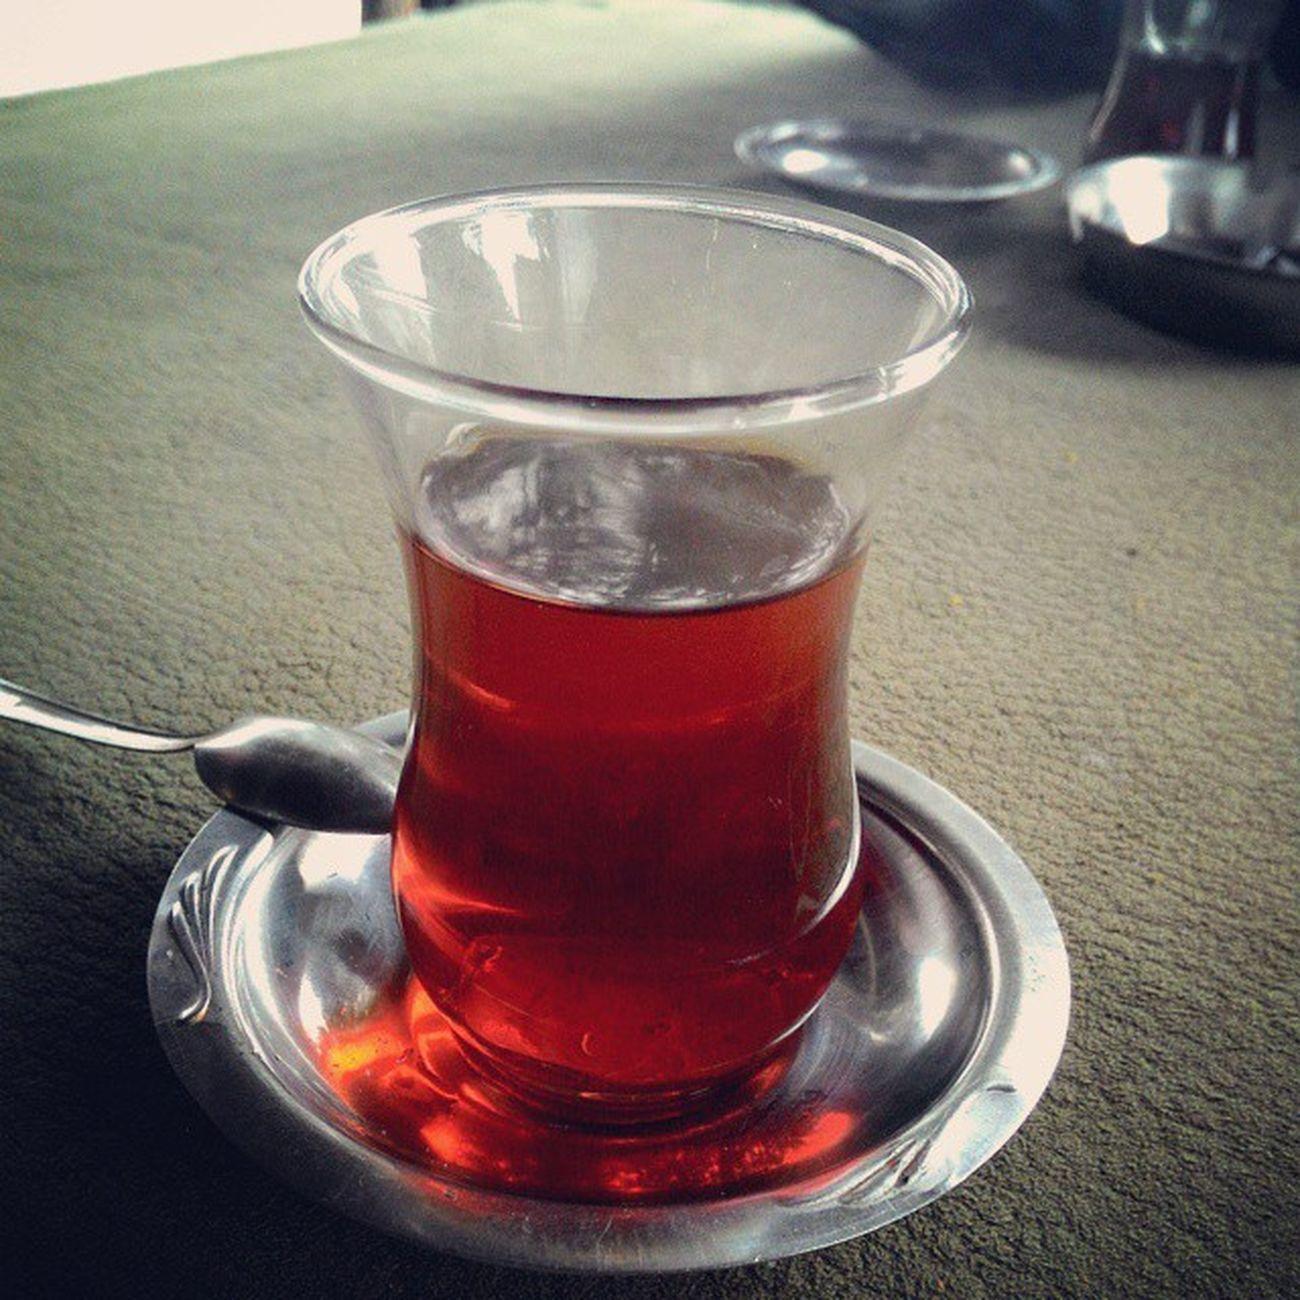 çay Candir Icersen Isinirsin